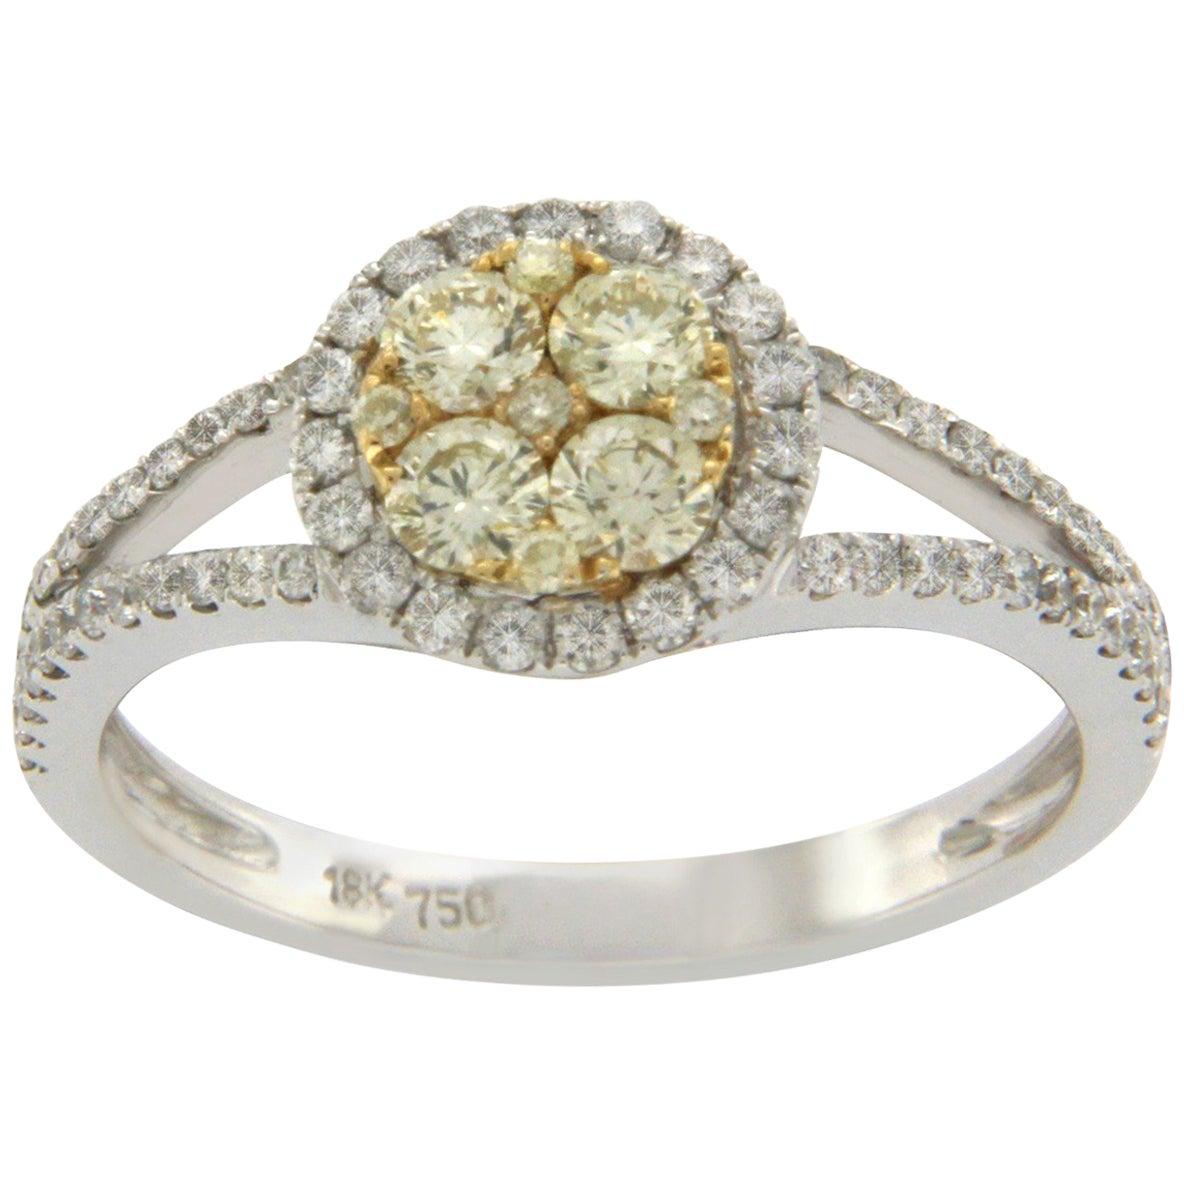 18 Karat White Gold 0.82 Carat Yellow and White Diamonds Engagement Ring